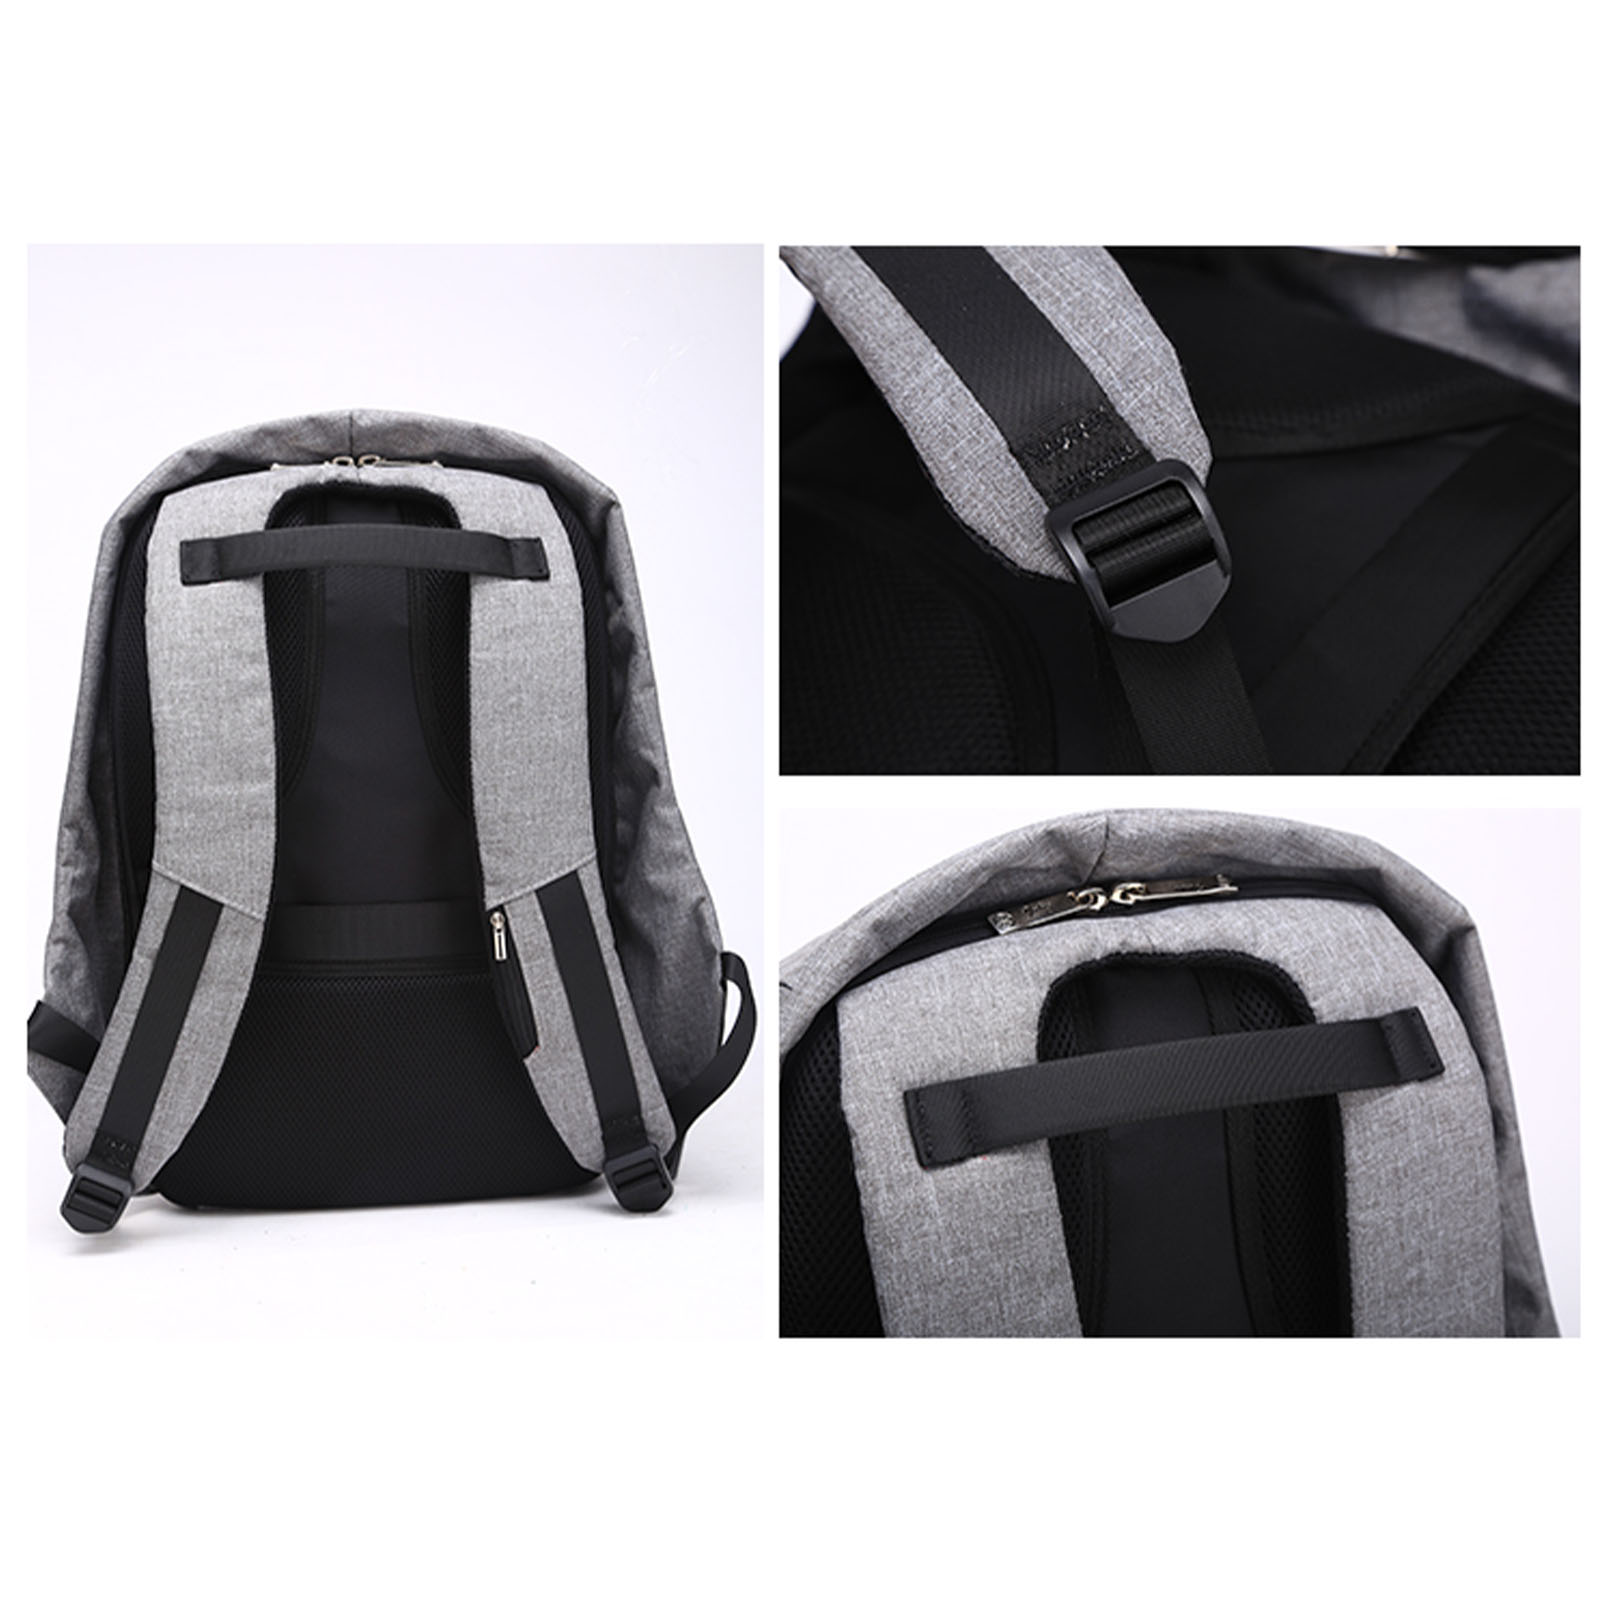 NEW-Anti-Theft-Backpack-Waterproof-bag-School-Travel-Laptop-Bags-USB-Charging